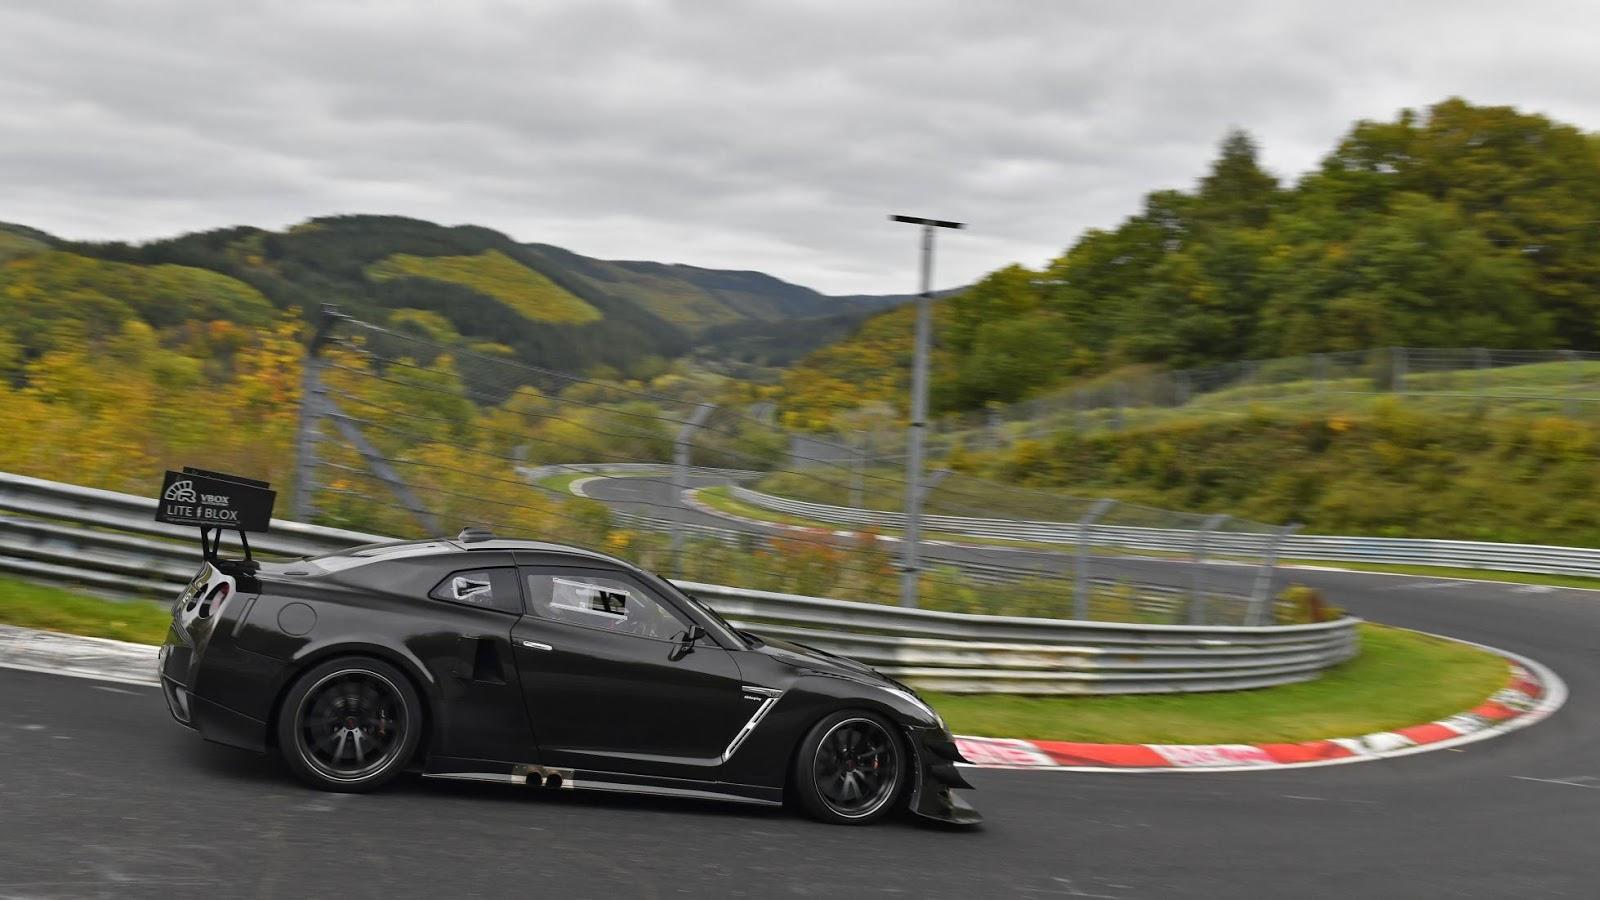 Litchfield-Nissan-GT-R-Nurburgring-21